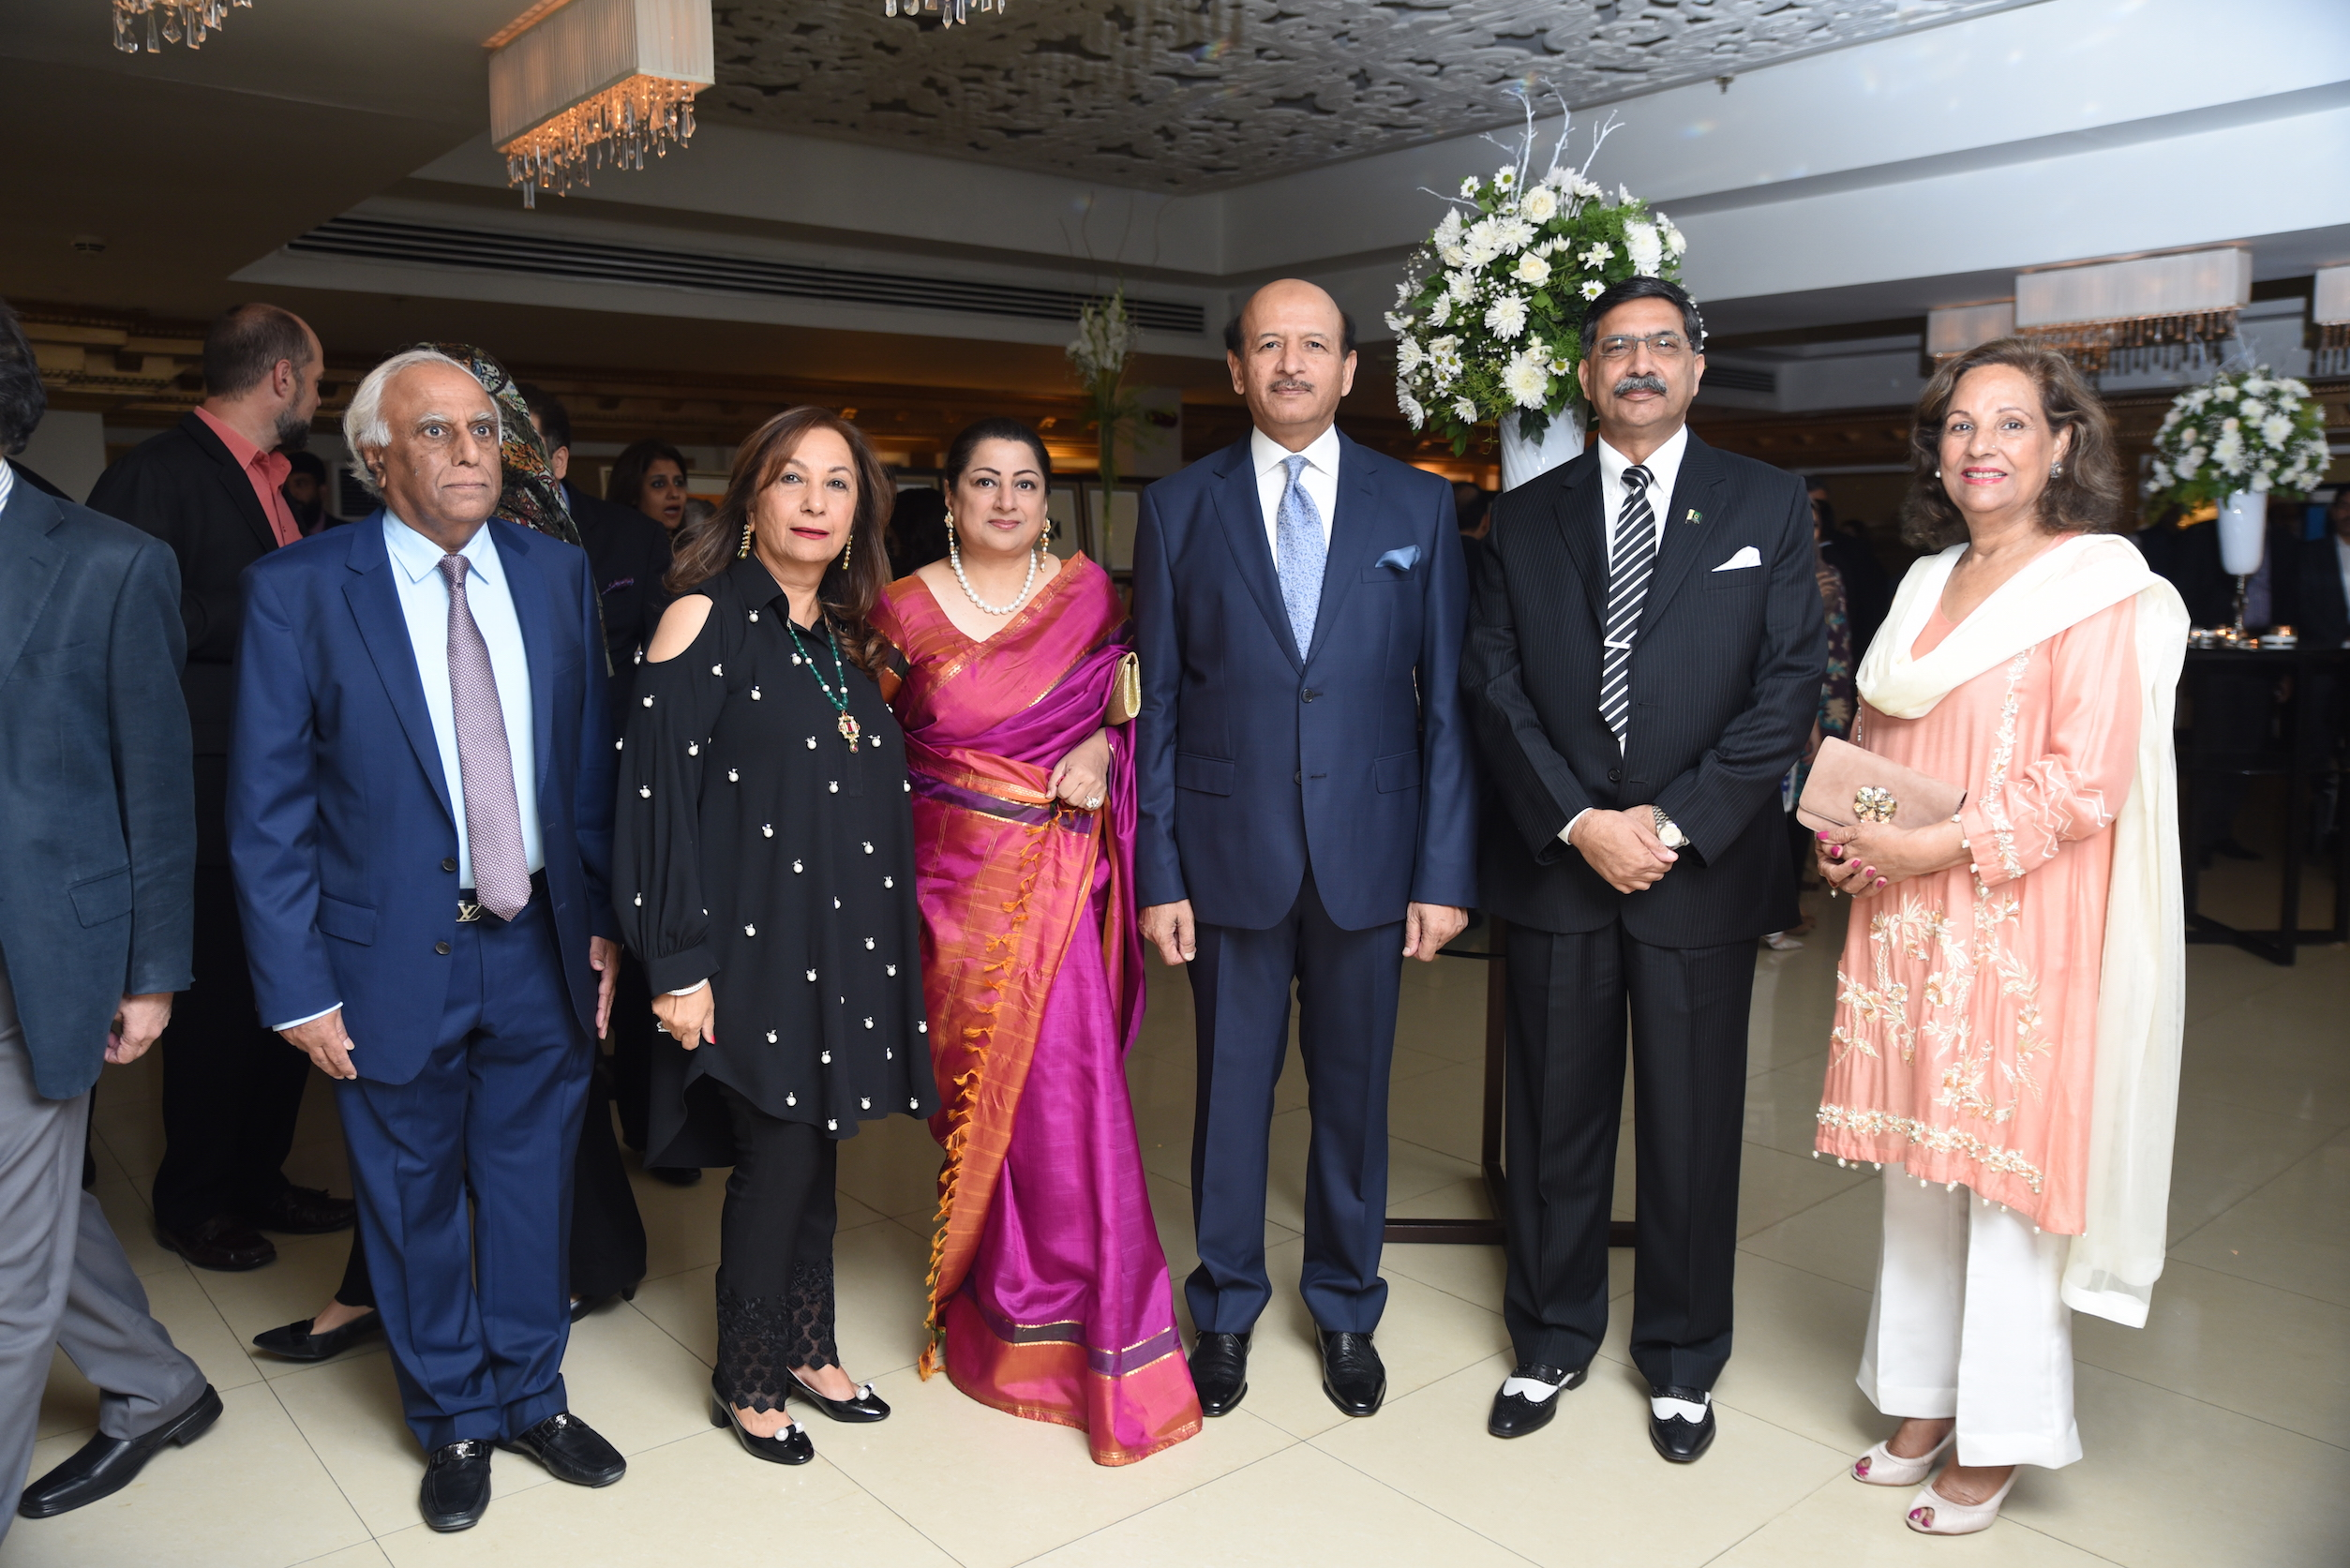 Dr Amjad, Mrs Amjad, Romana and her husband General (retd) Zahid and General Ijaz Chaudhry Secretary Defence production